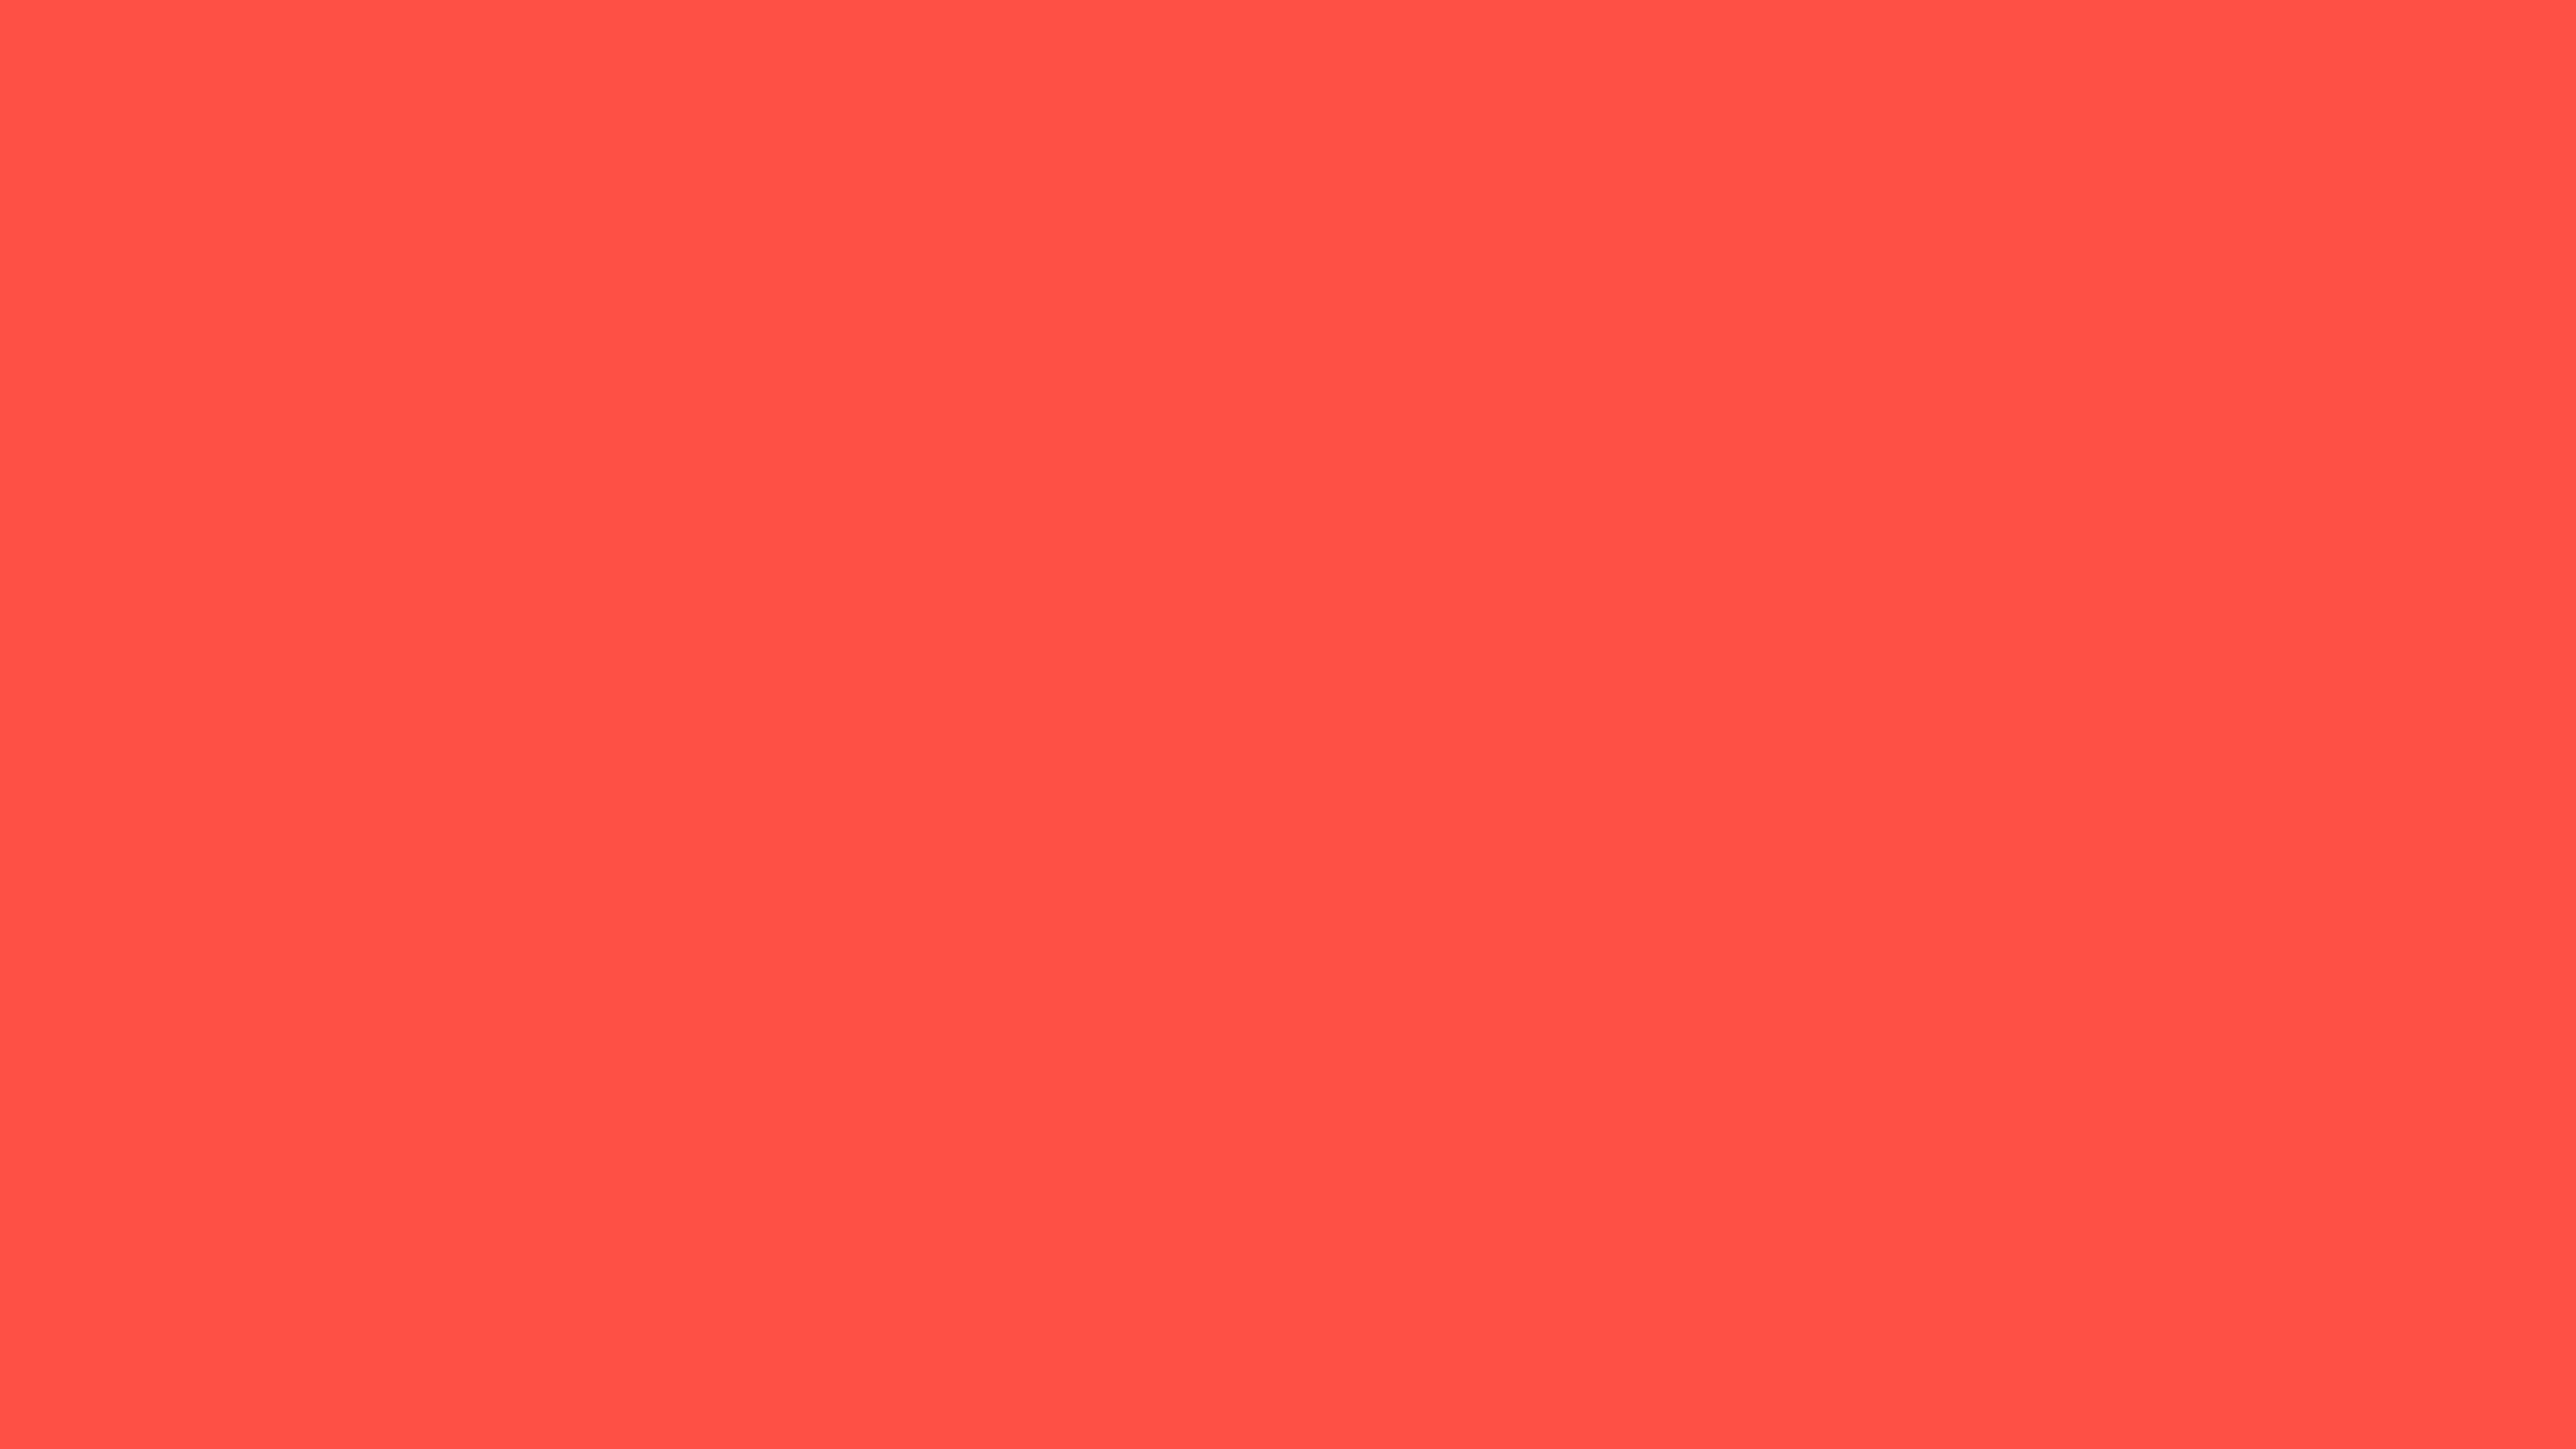 4096x2304 Red-orange Solid Color Background